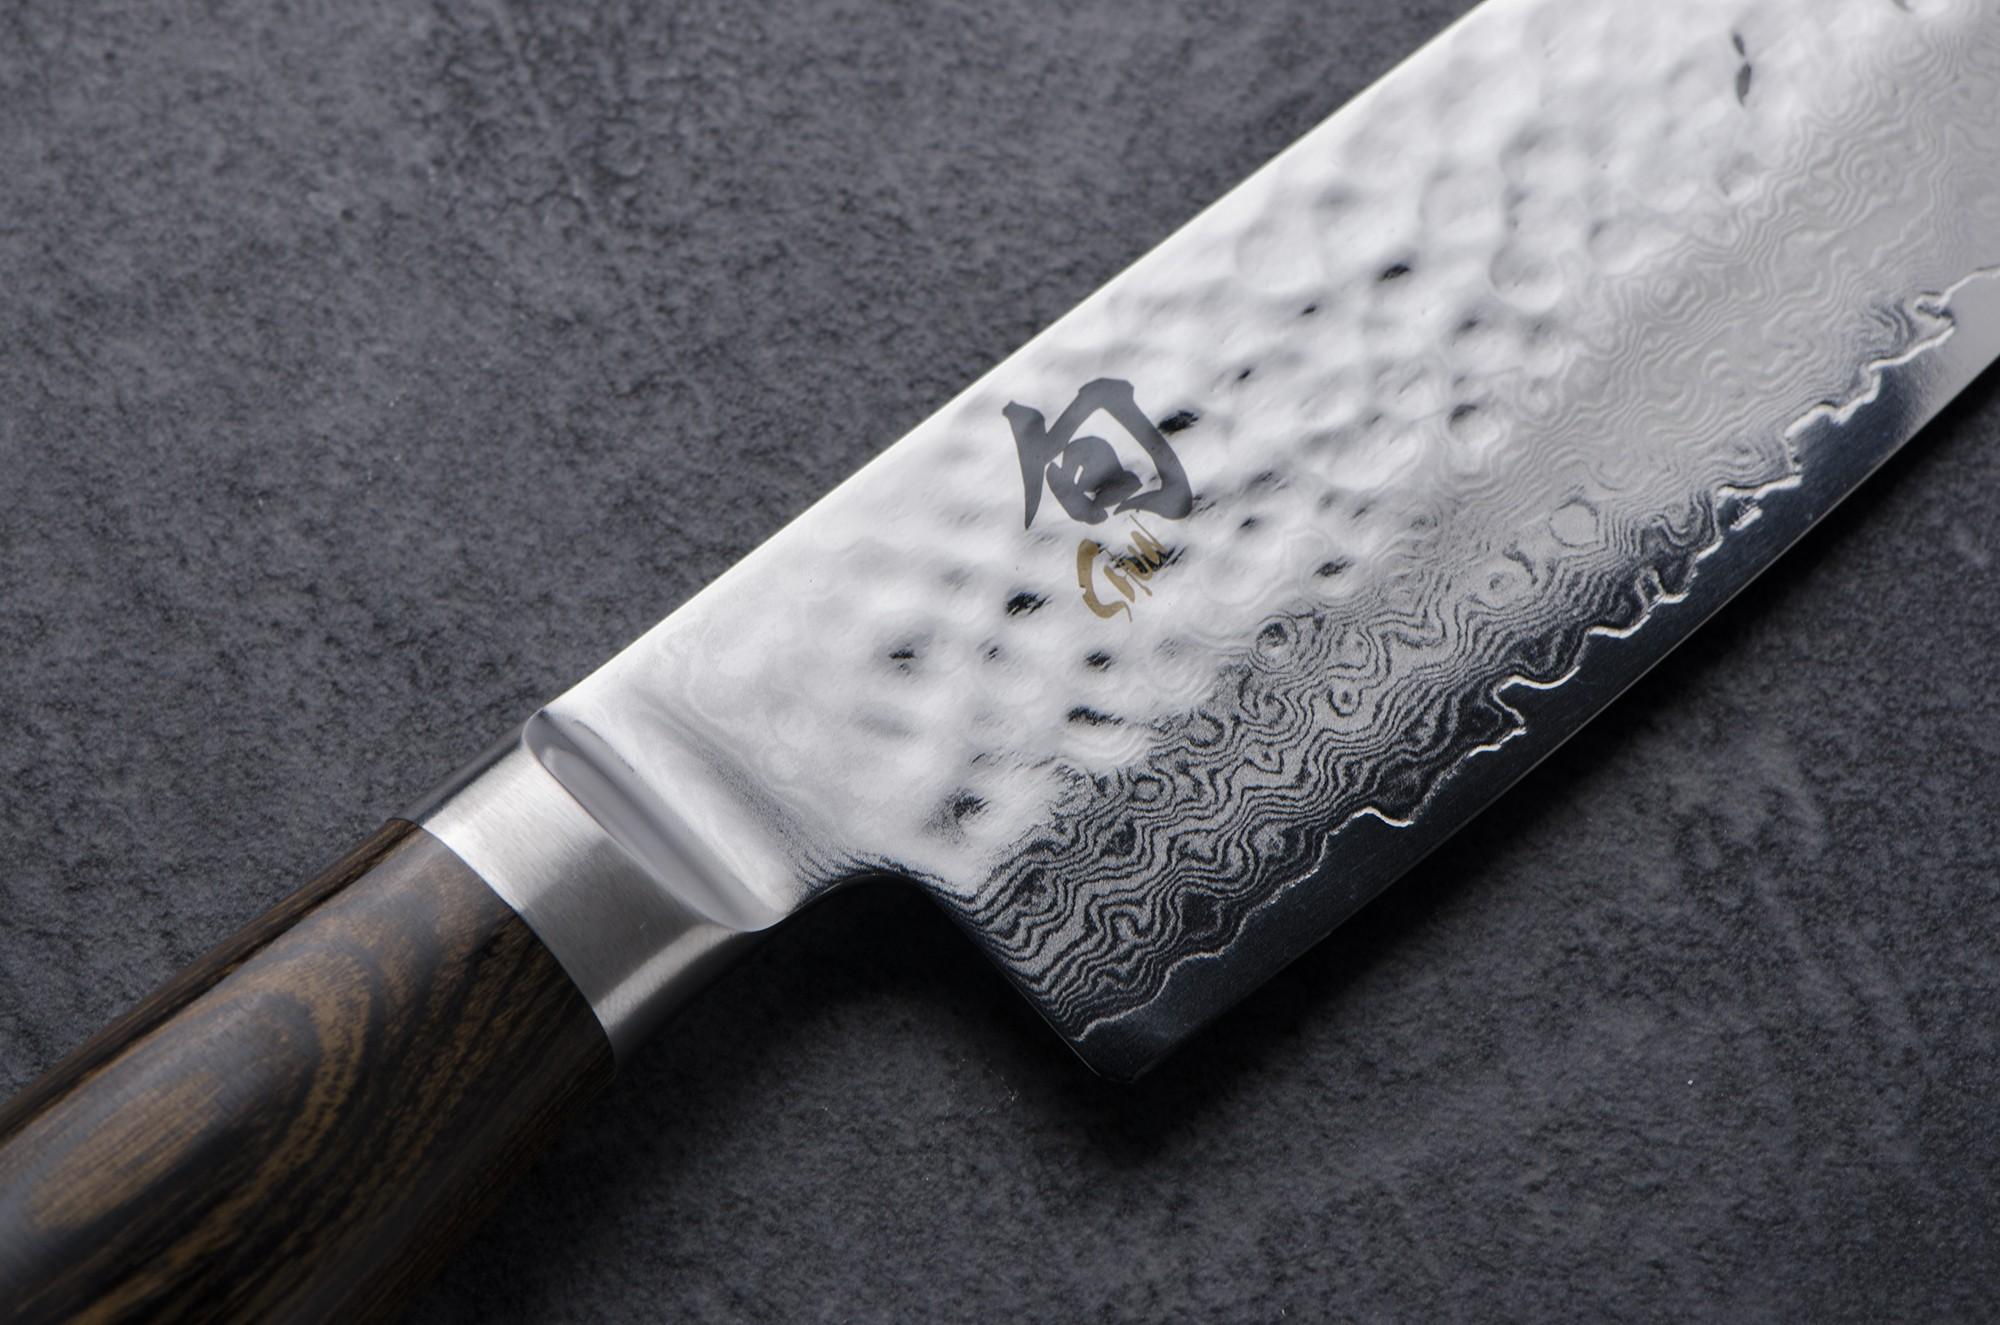 couteau à trancher kai tim malzer damas 24 cm - colichef